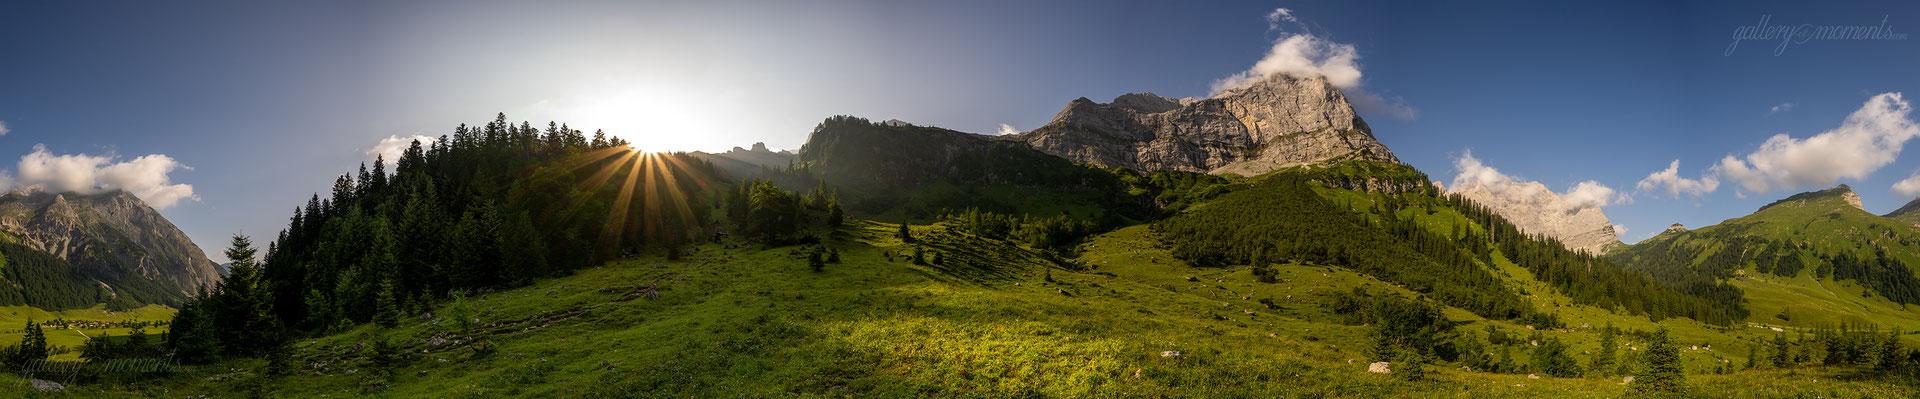 Sonnenaufgang in der Eng, Karwendel / Tirol (Bildnummer 701427)